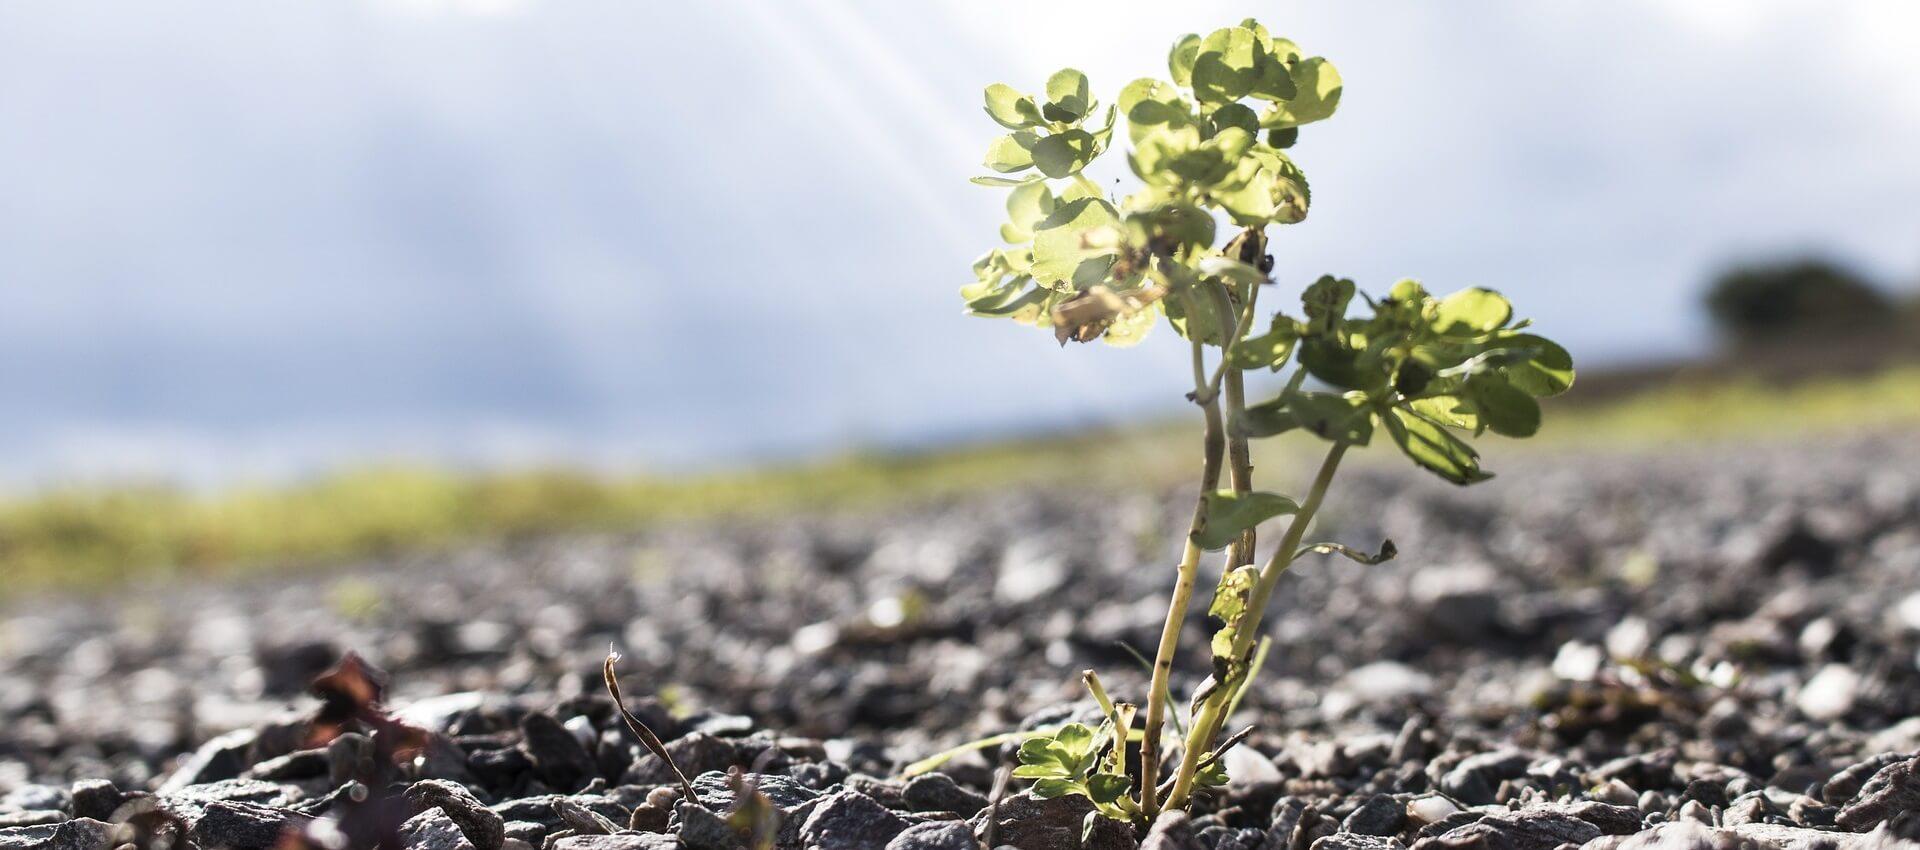 Responsabilidad social corporativa, garantiza tu sostenibilidad